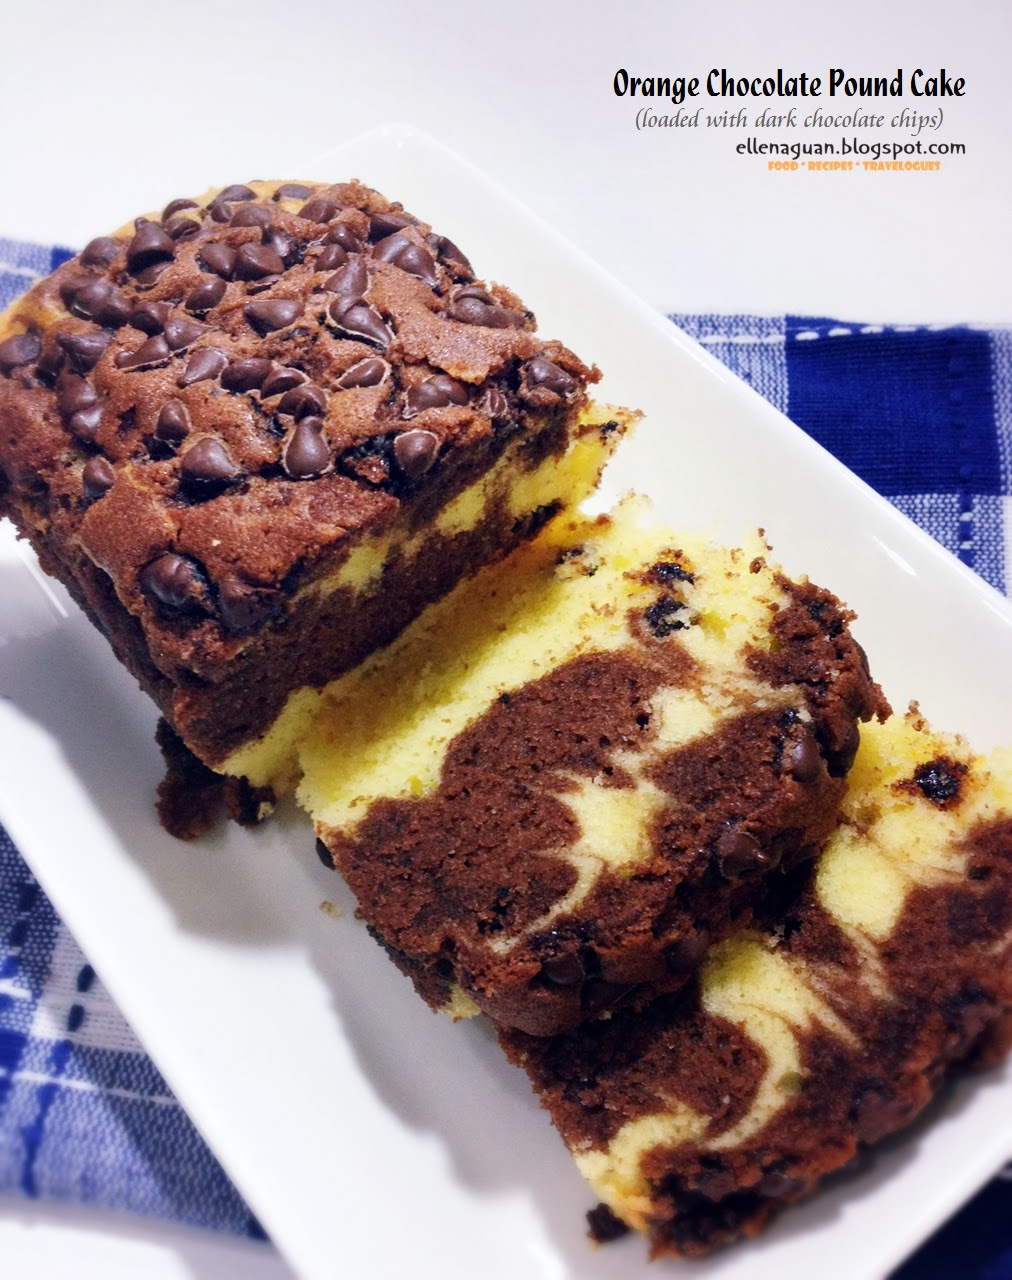 Chocolate chocolate chip pound cake recipes - Food Recipes Here